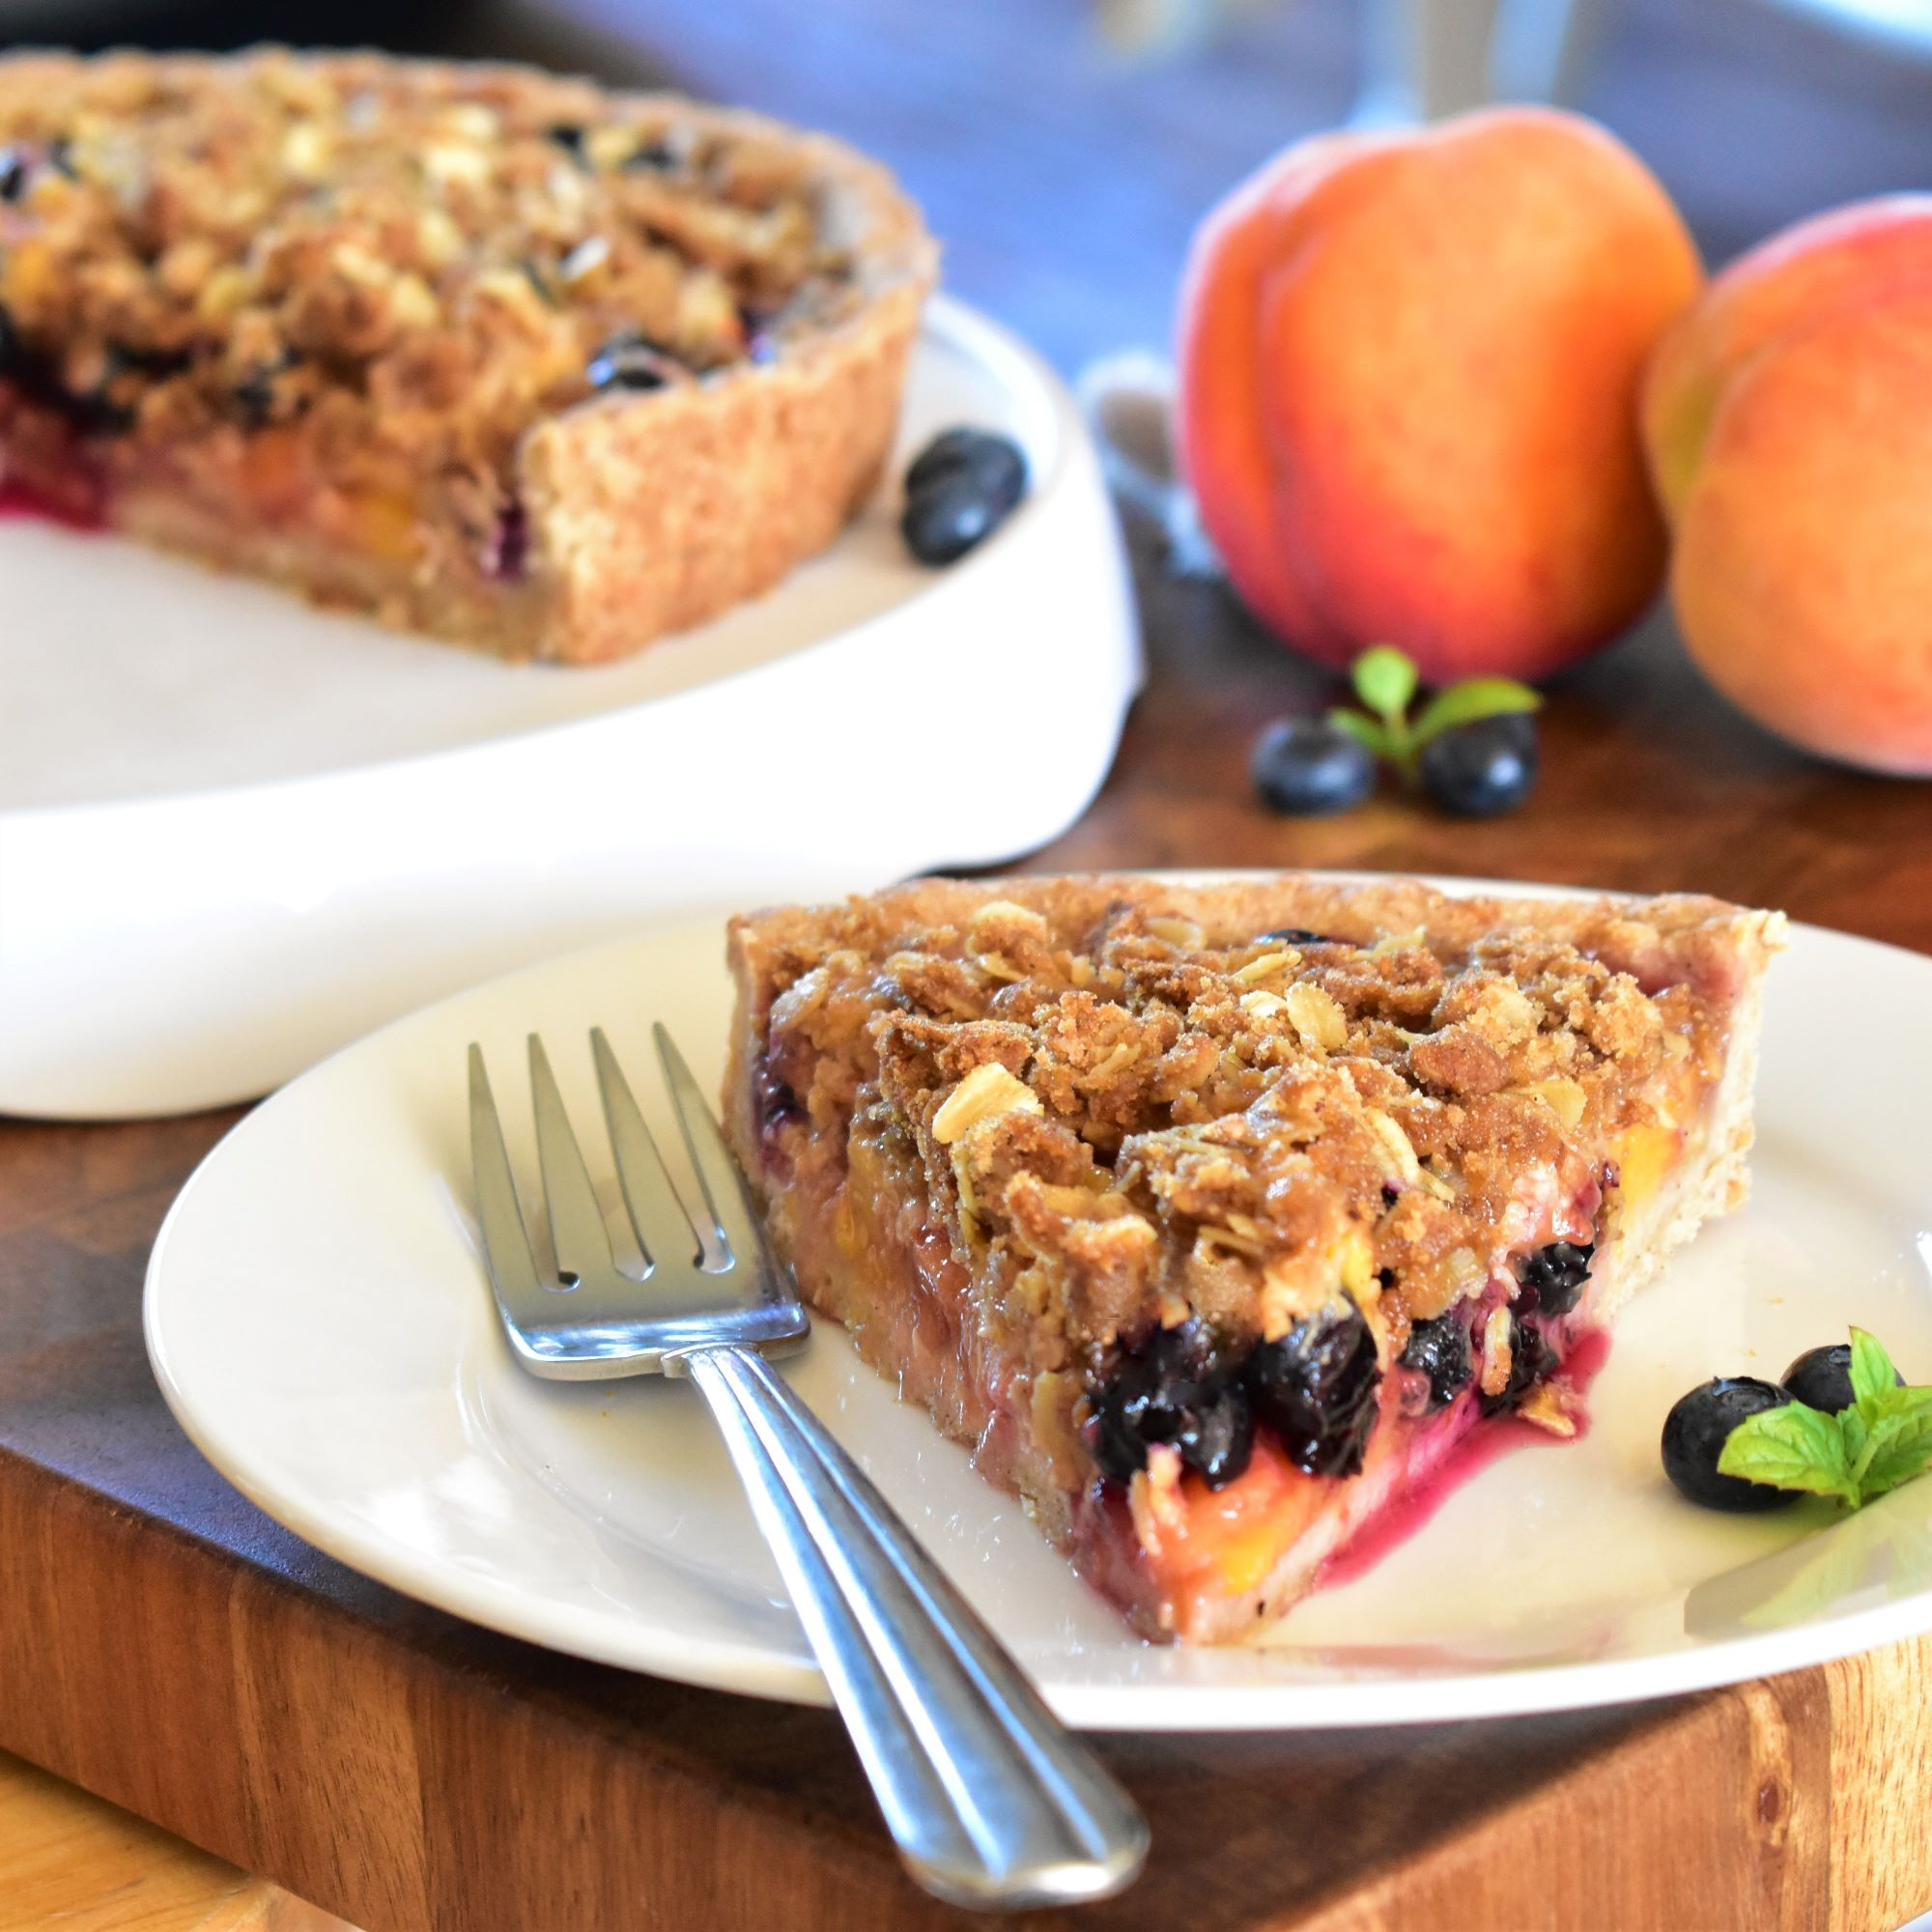 Peach-Blueberry Streusel Tart